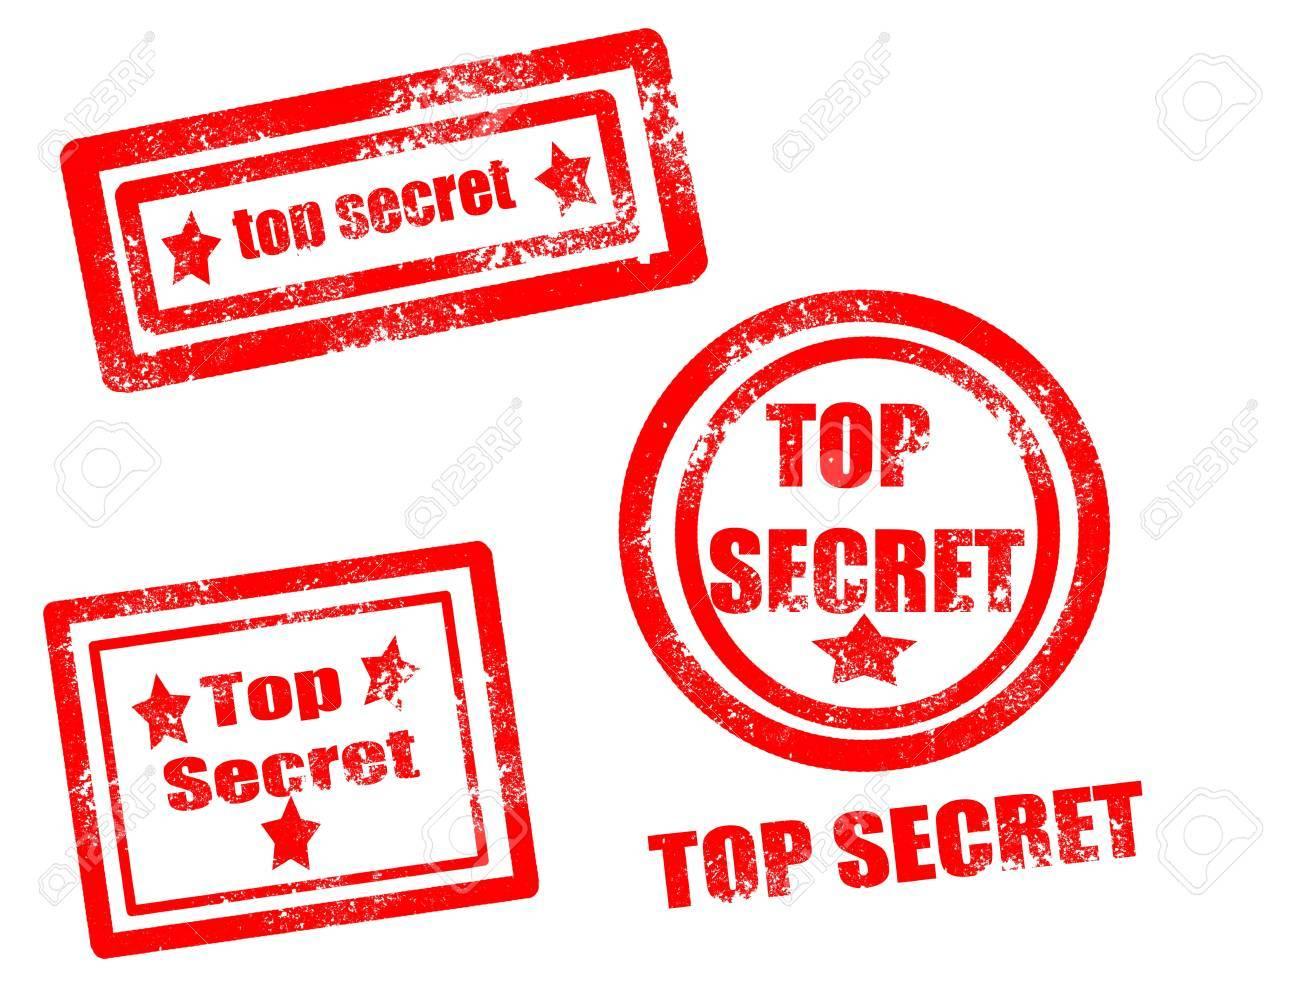 Top secret stamp on white background vector illustration Stock Vector - 17708079